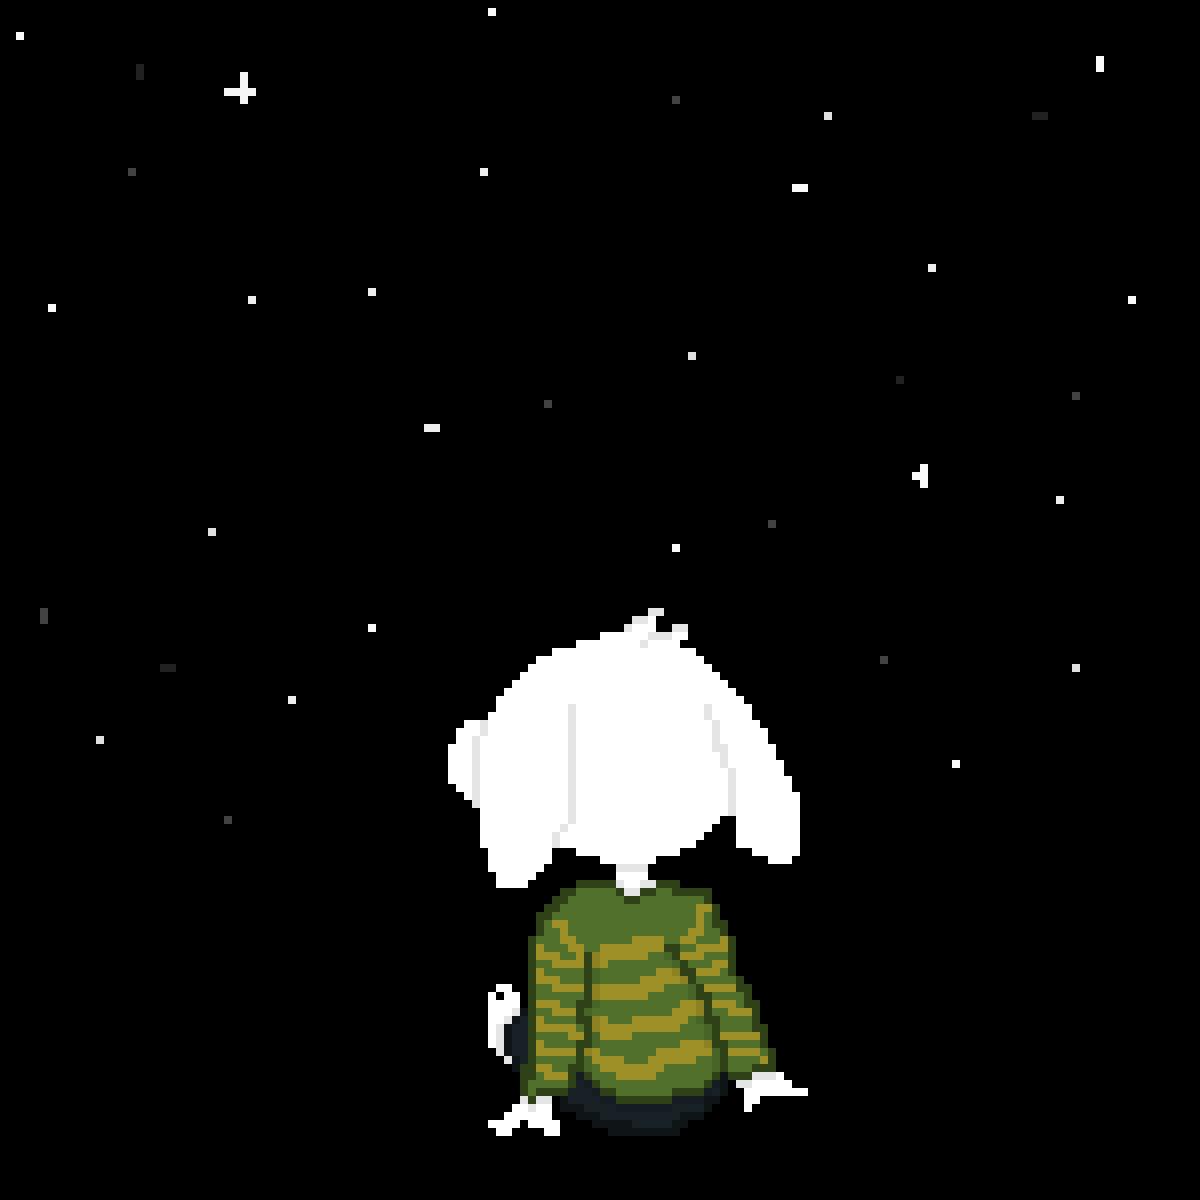 Asriel sees the stars by SnowburstWoF